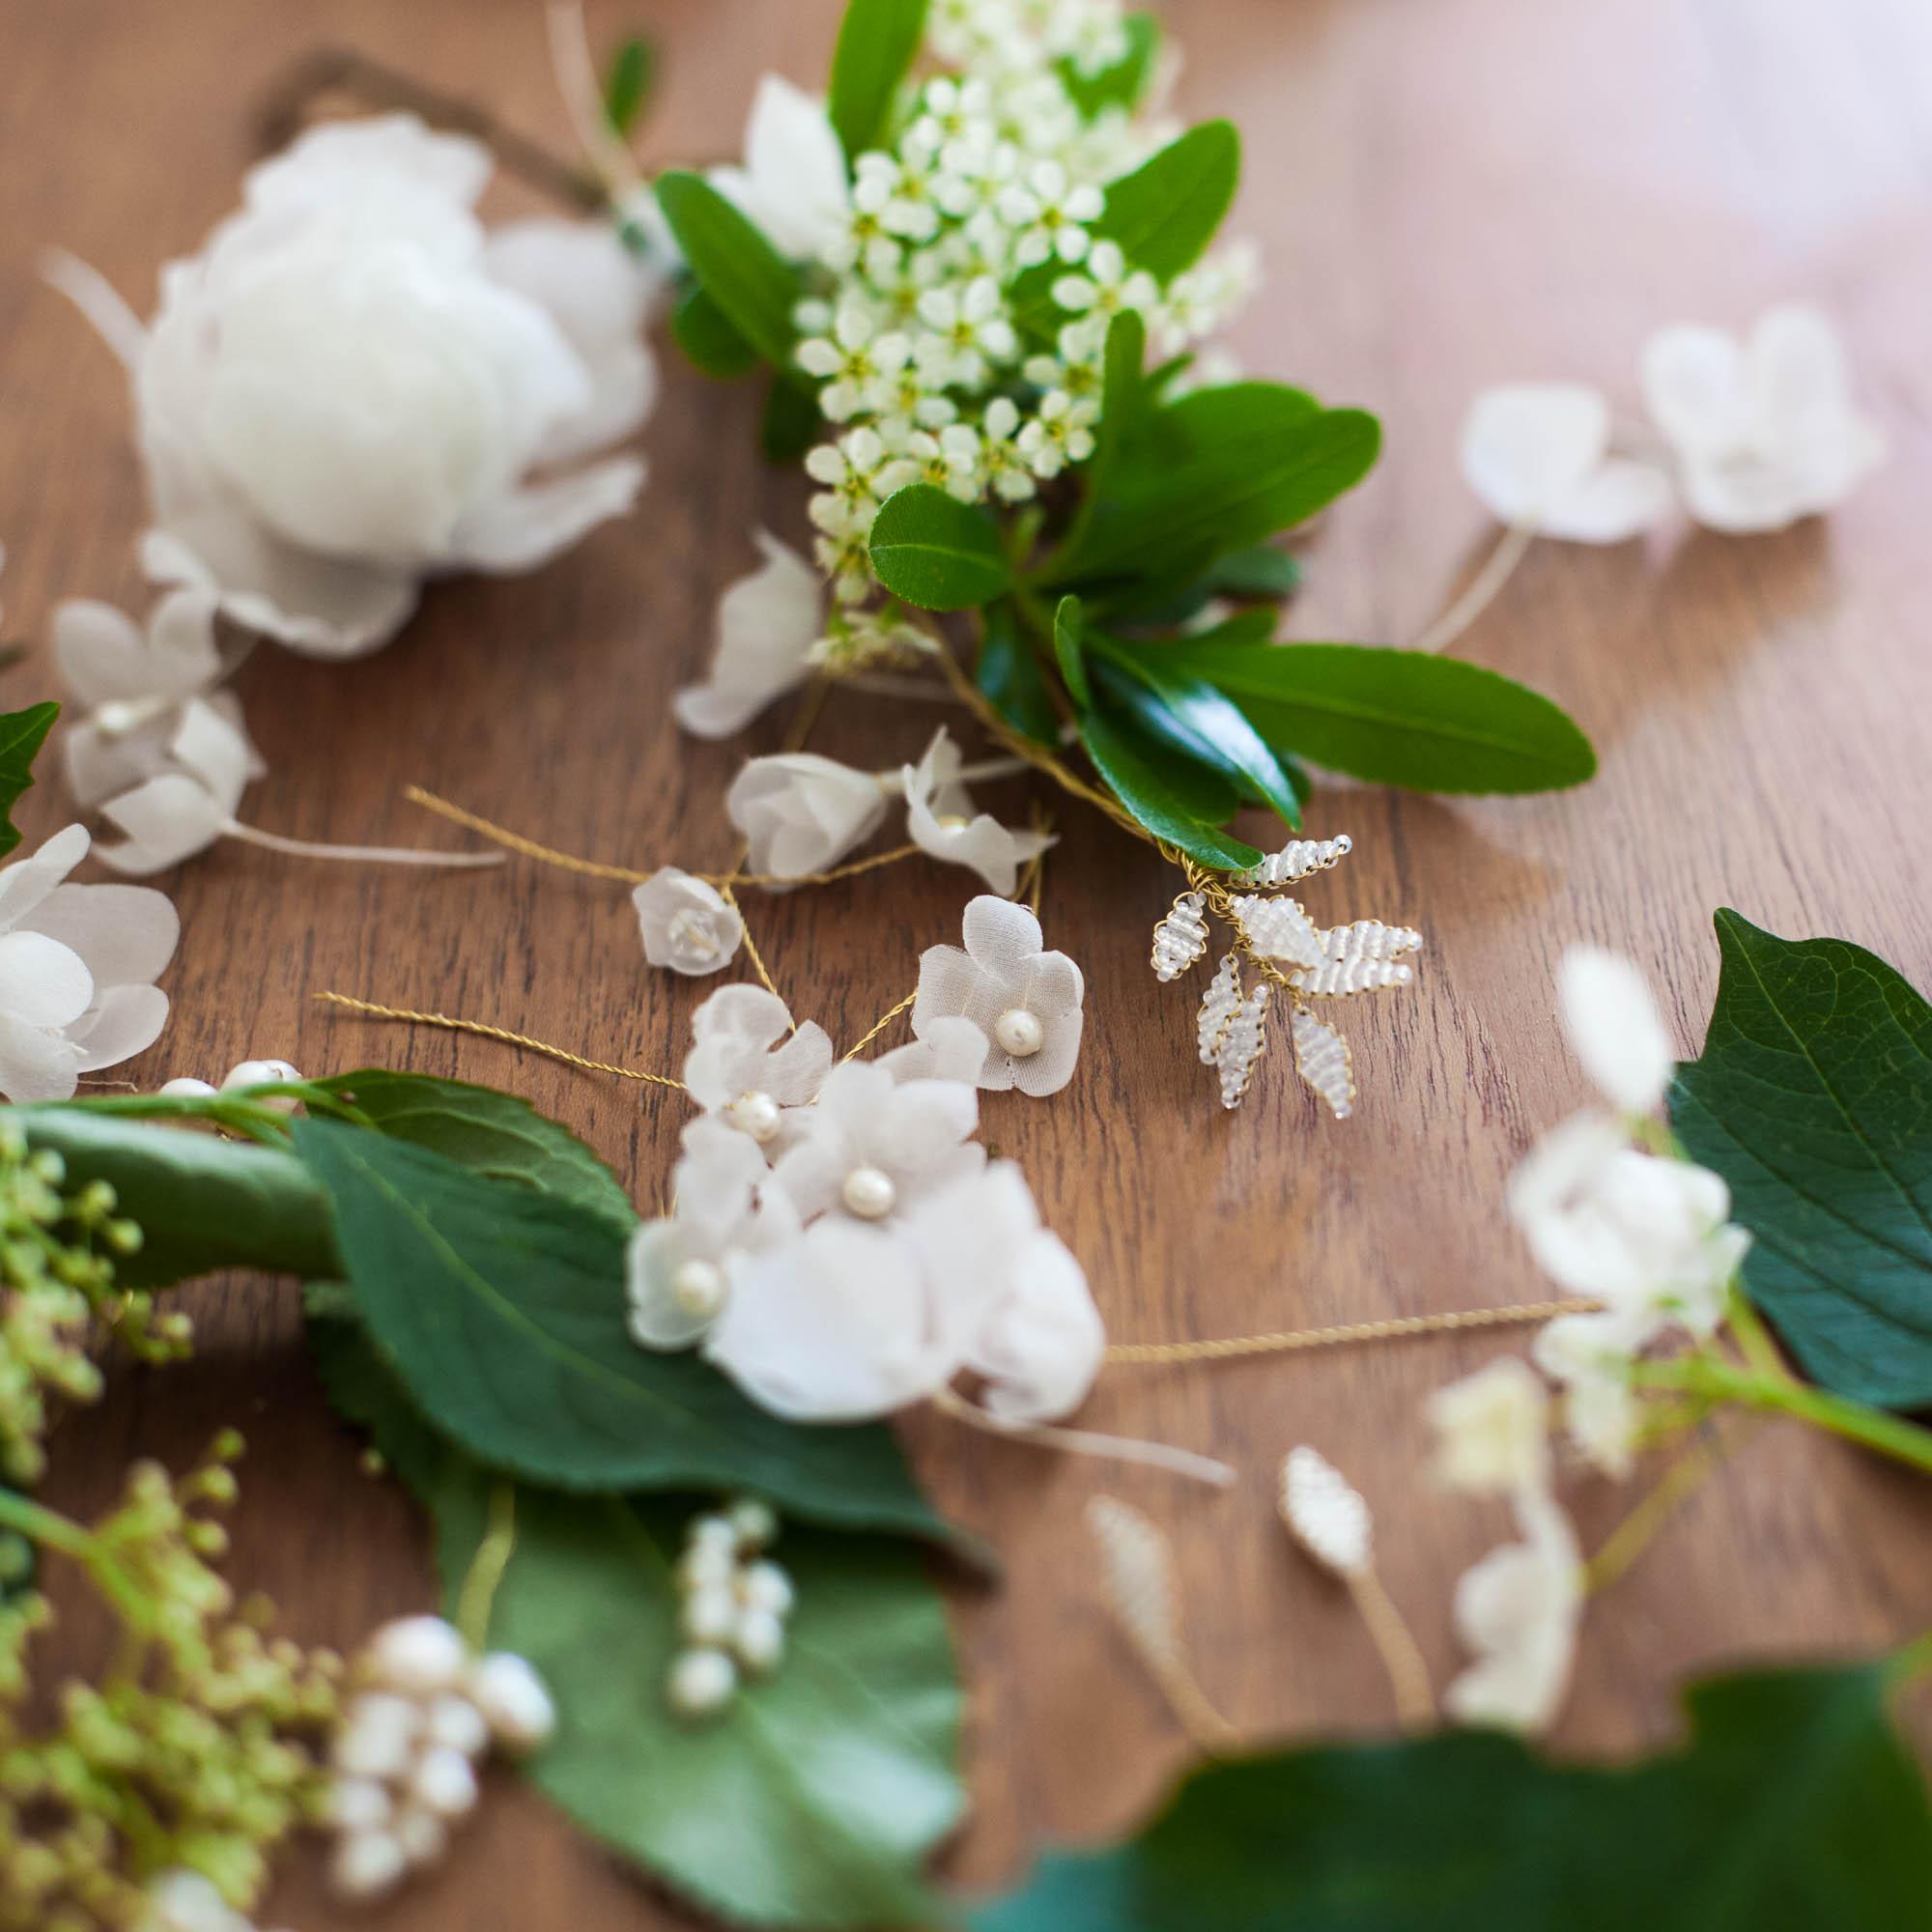 white-handmade-silk-flowers-wedding-work-in-progress-creative-bridal-studio